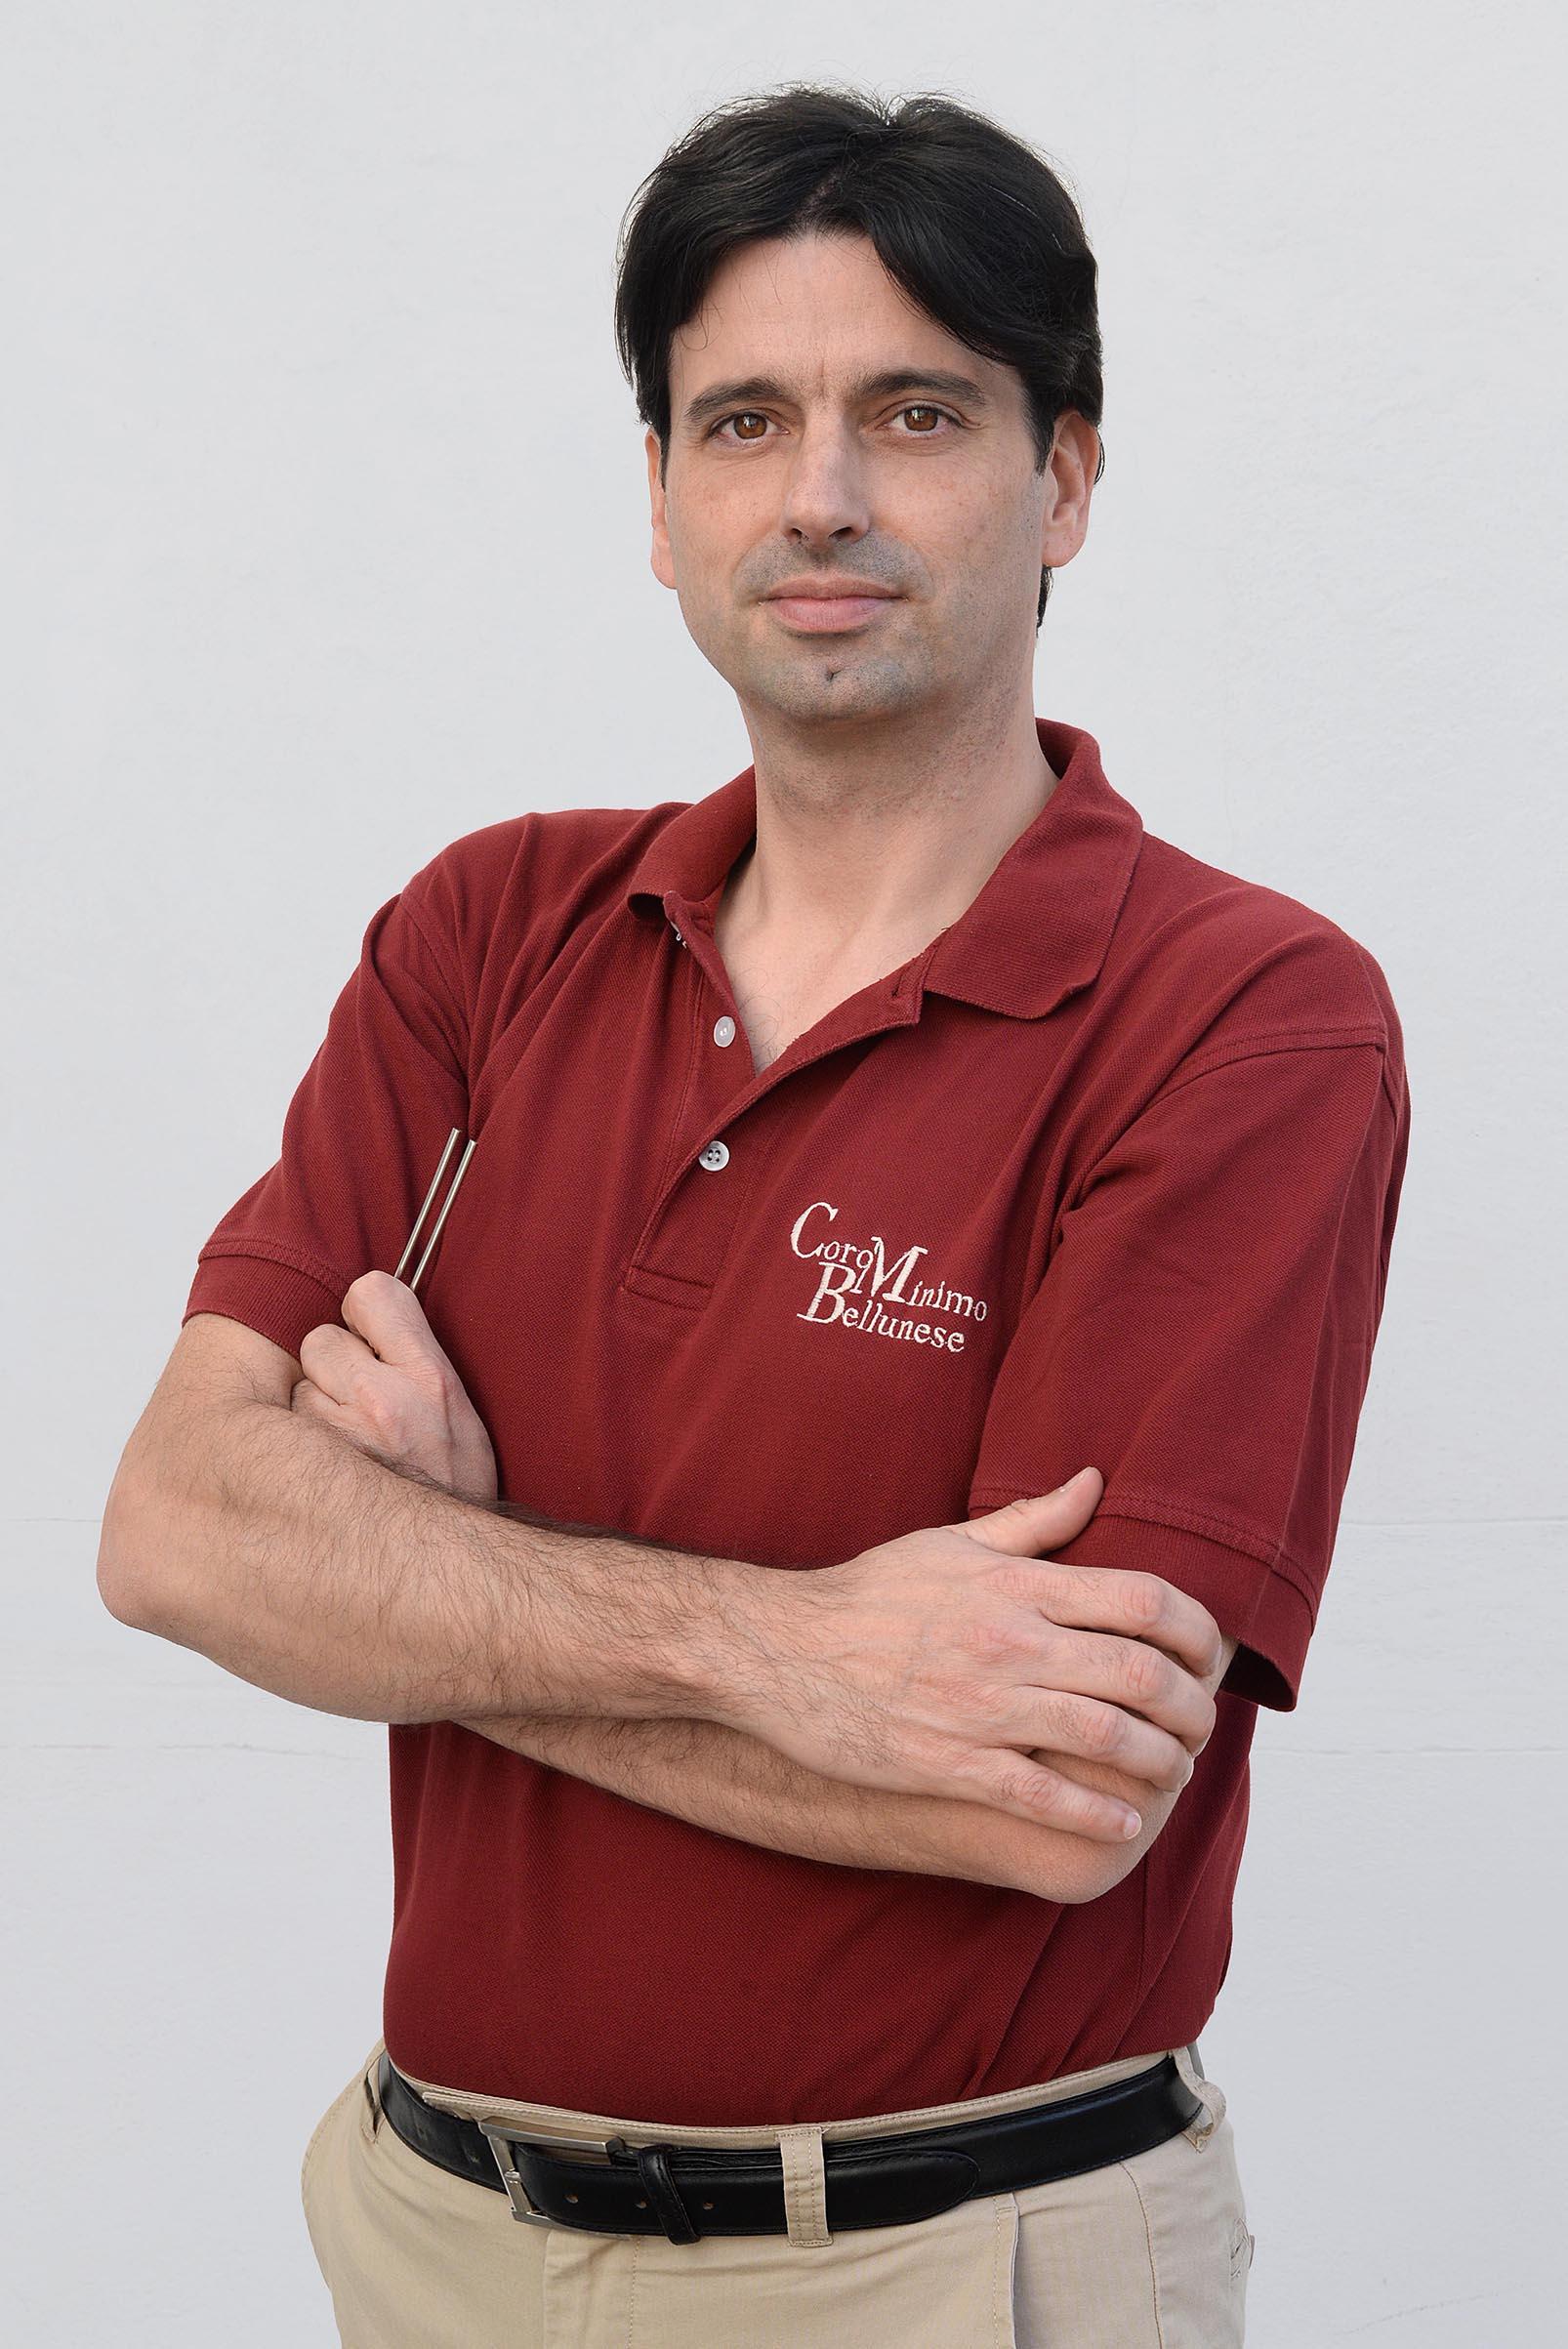 Gianluca Nicolai